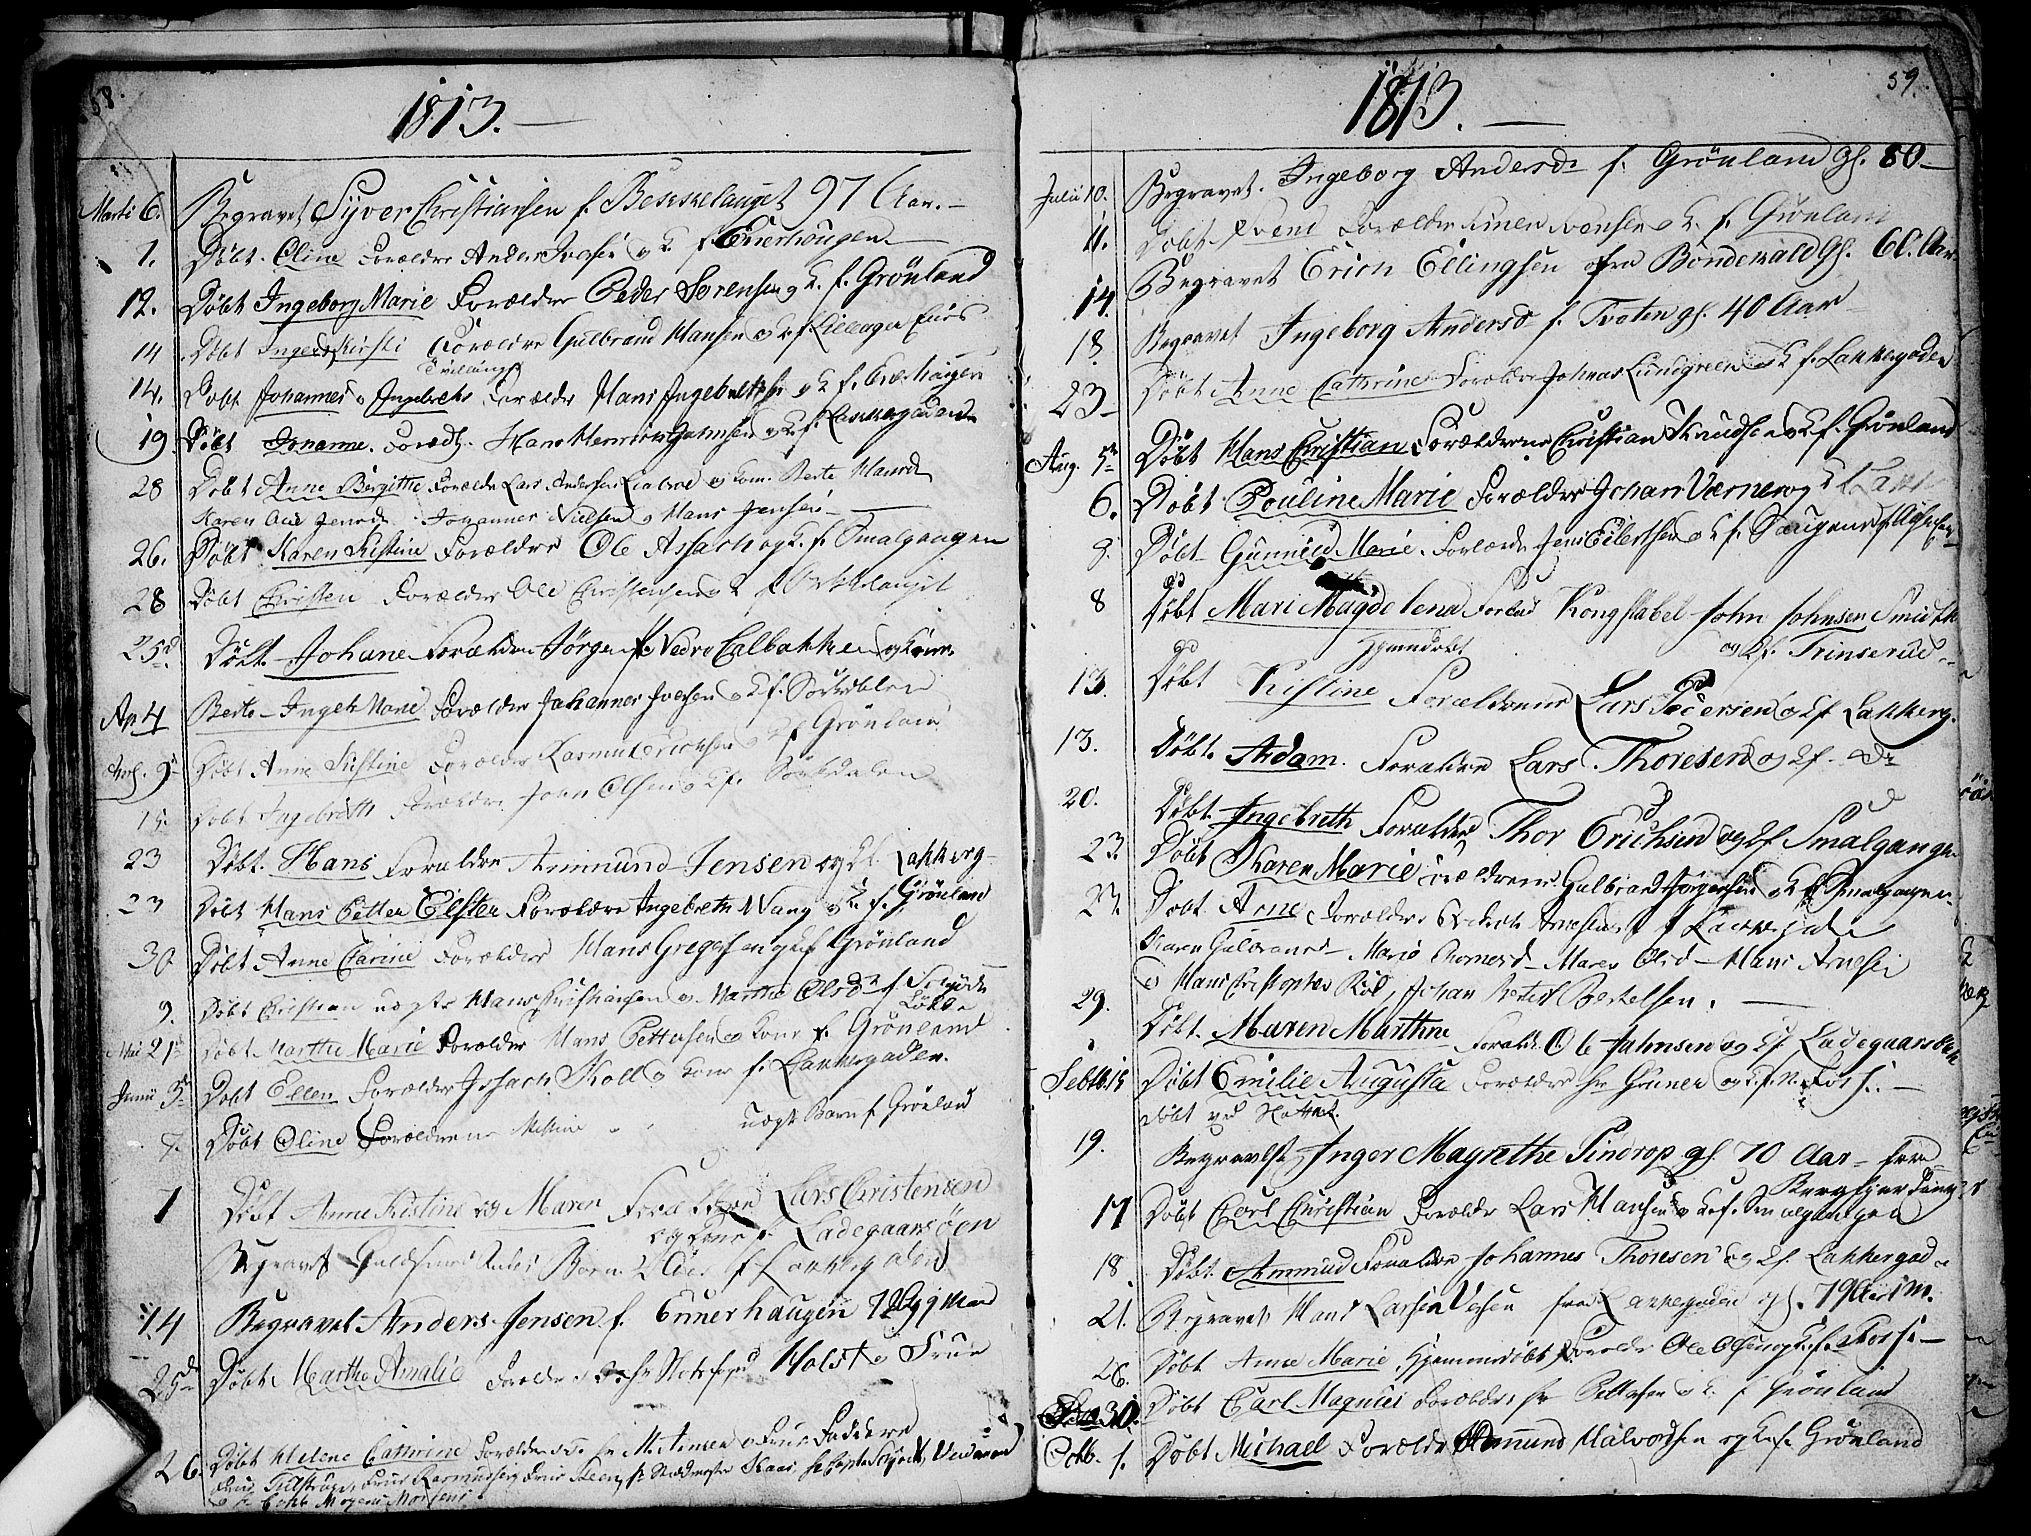 SAO, Aker prestekontor kirkebøker, G/L0001: Parish register (copy) no. 1, 1796-1826, p. 58-59